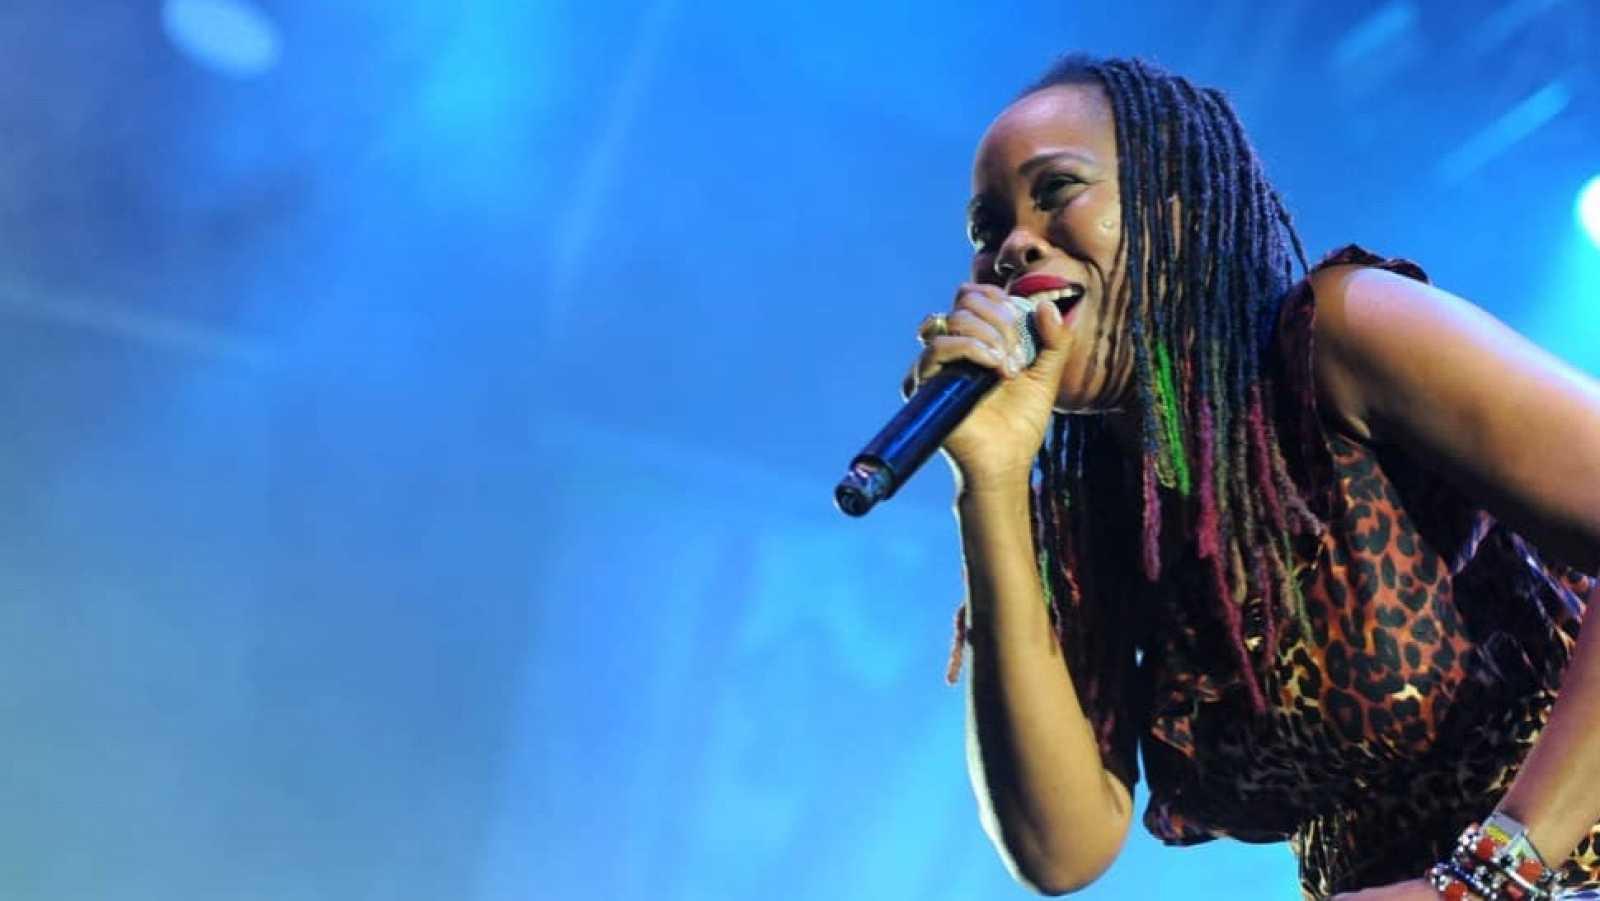 Festivales - Rototom 2019: Queen Ifrica - 20/08/19 - Escuchar ahora